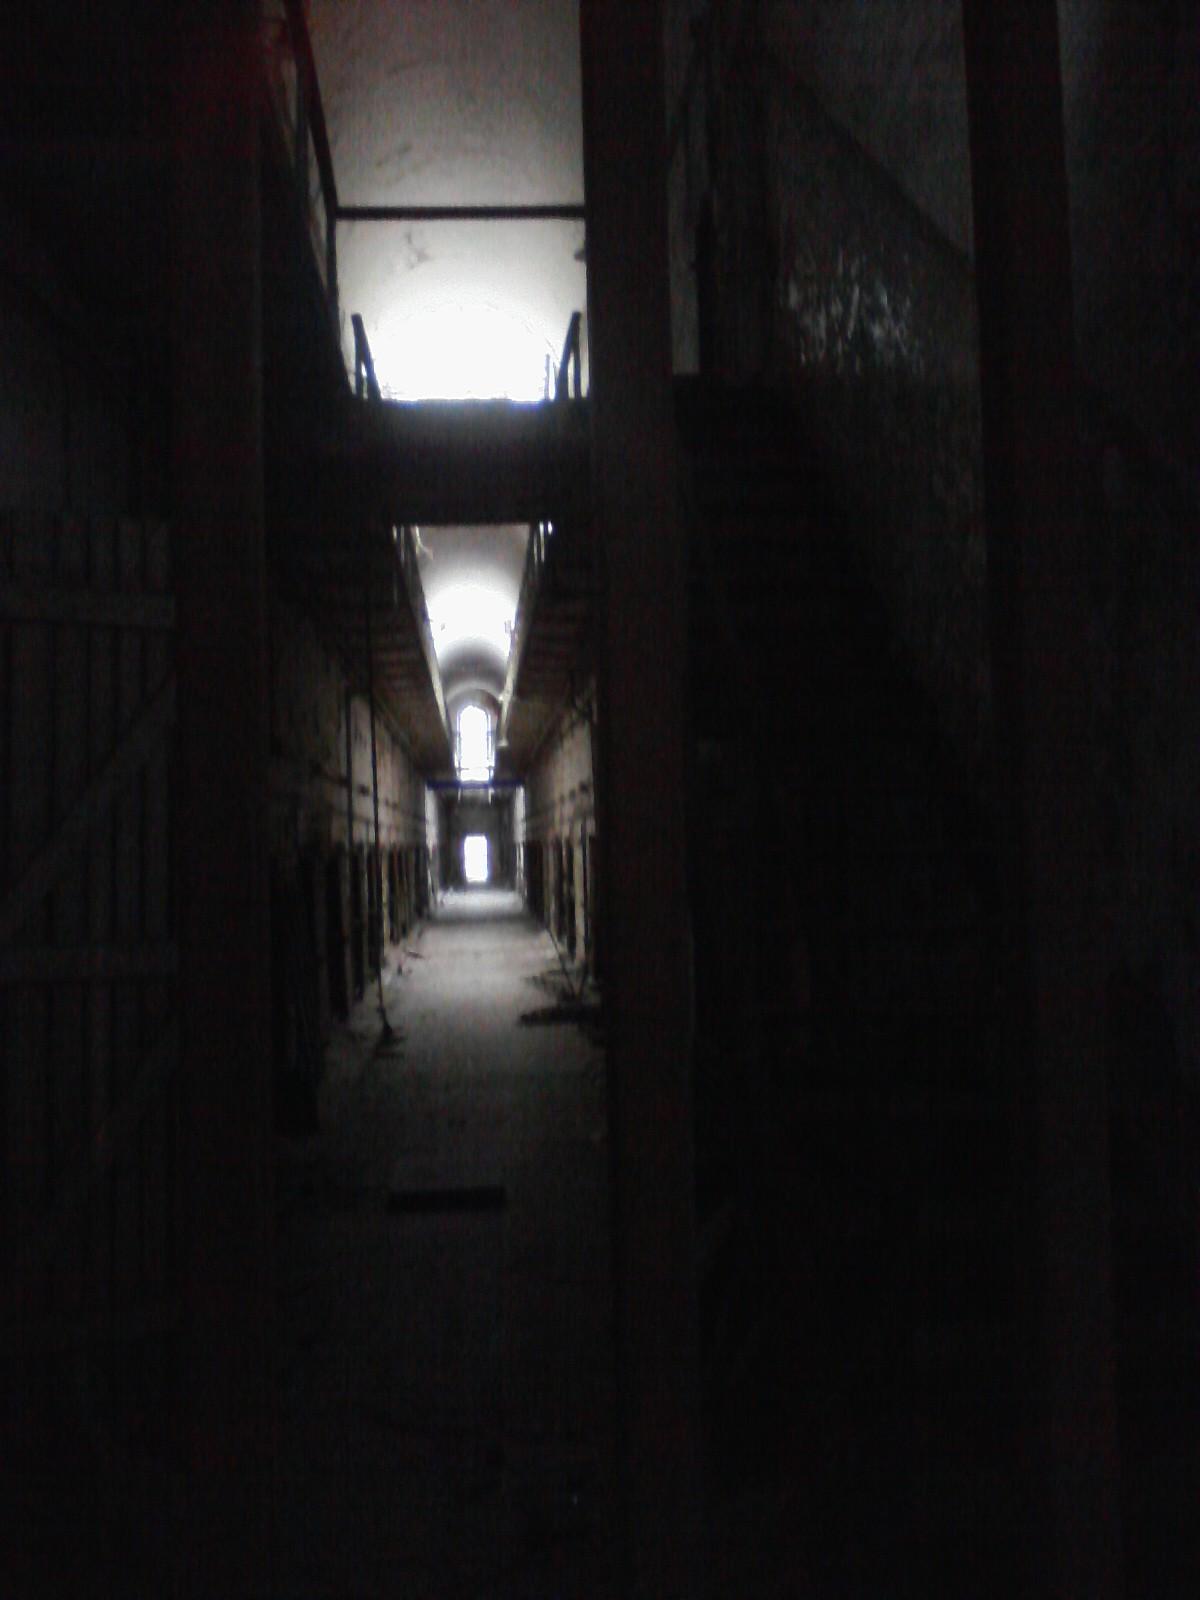 Eastern State Penitentiary | thirteenghostsparanoramal